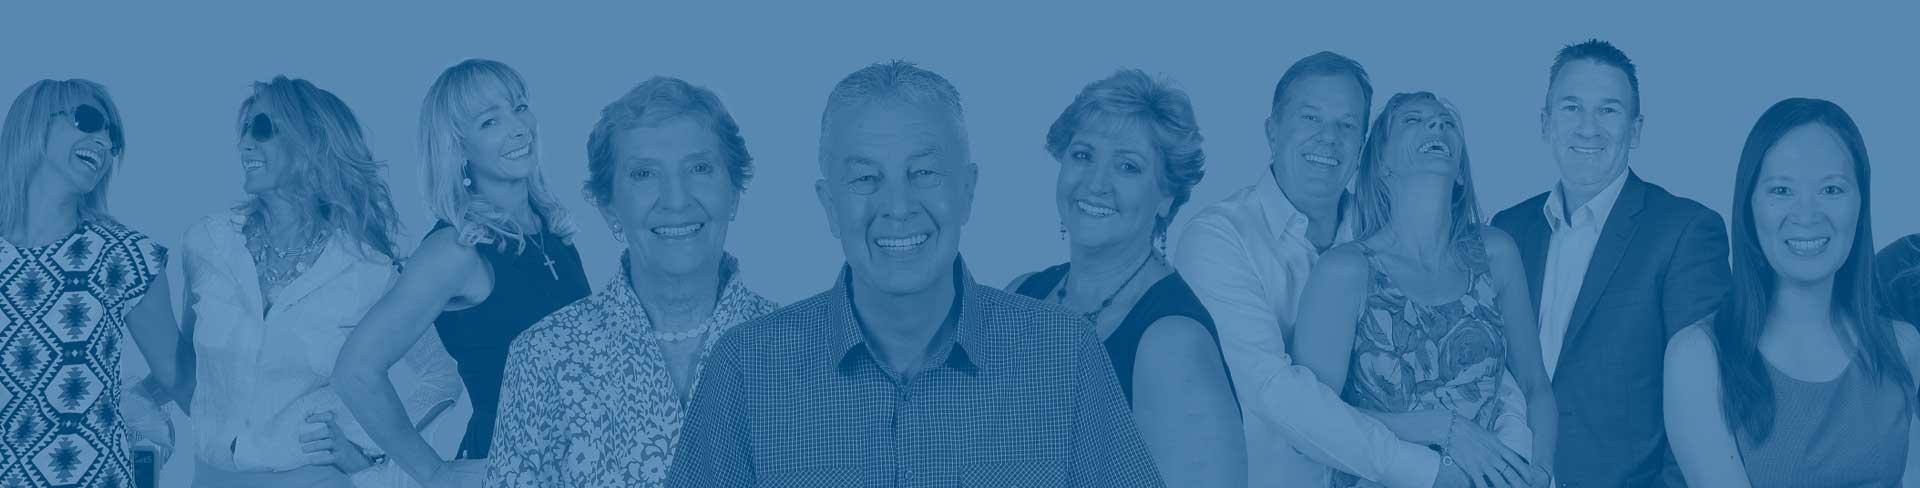 Teeth-Implants-Melbourne-Banner-100-3